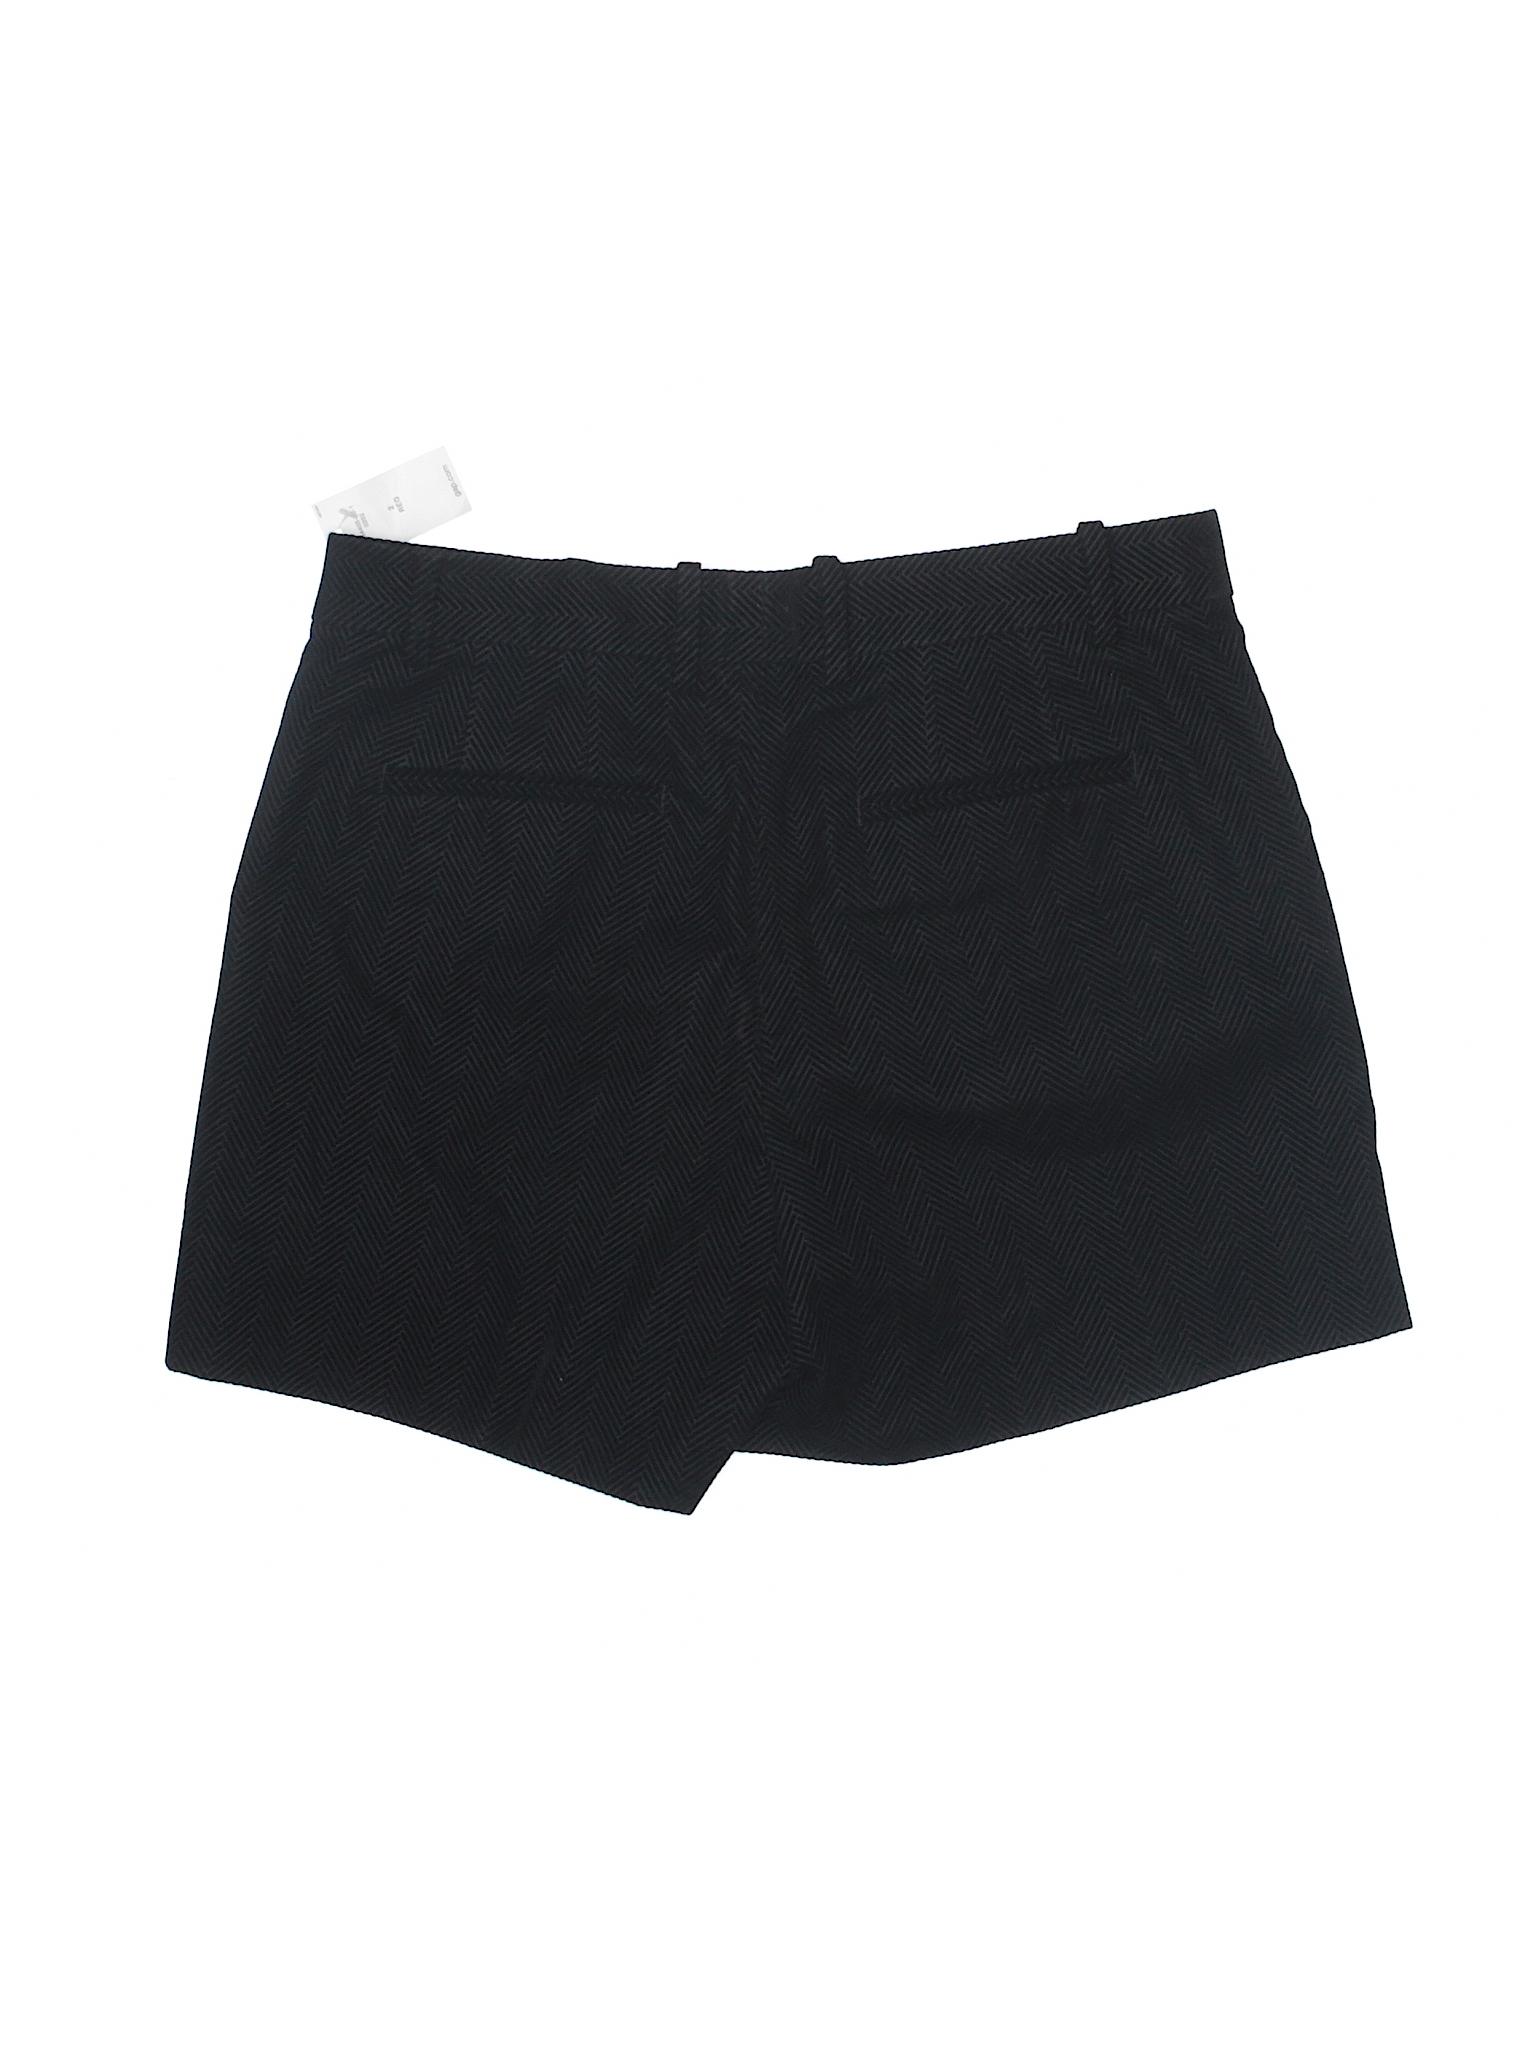 Gap Shorts Shorts Shorts Leisure Leisure Leisure winter Leisure winter Shorts Gap winter winter Gap Leisure Gap dfanZ5